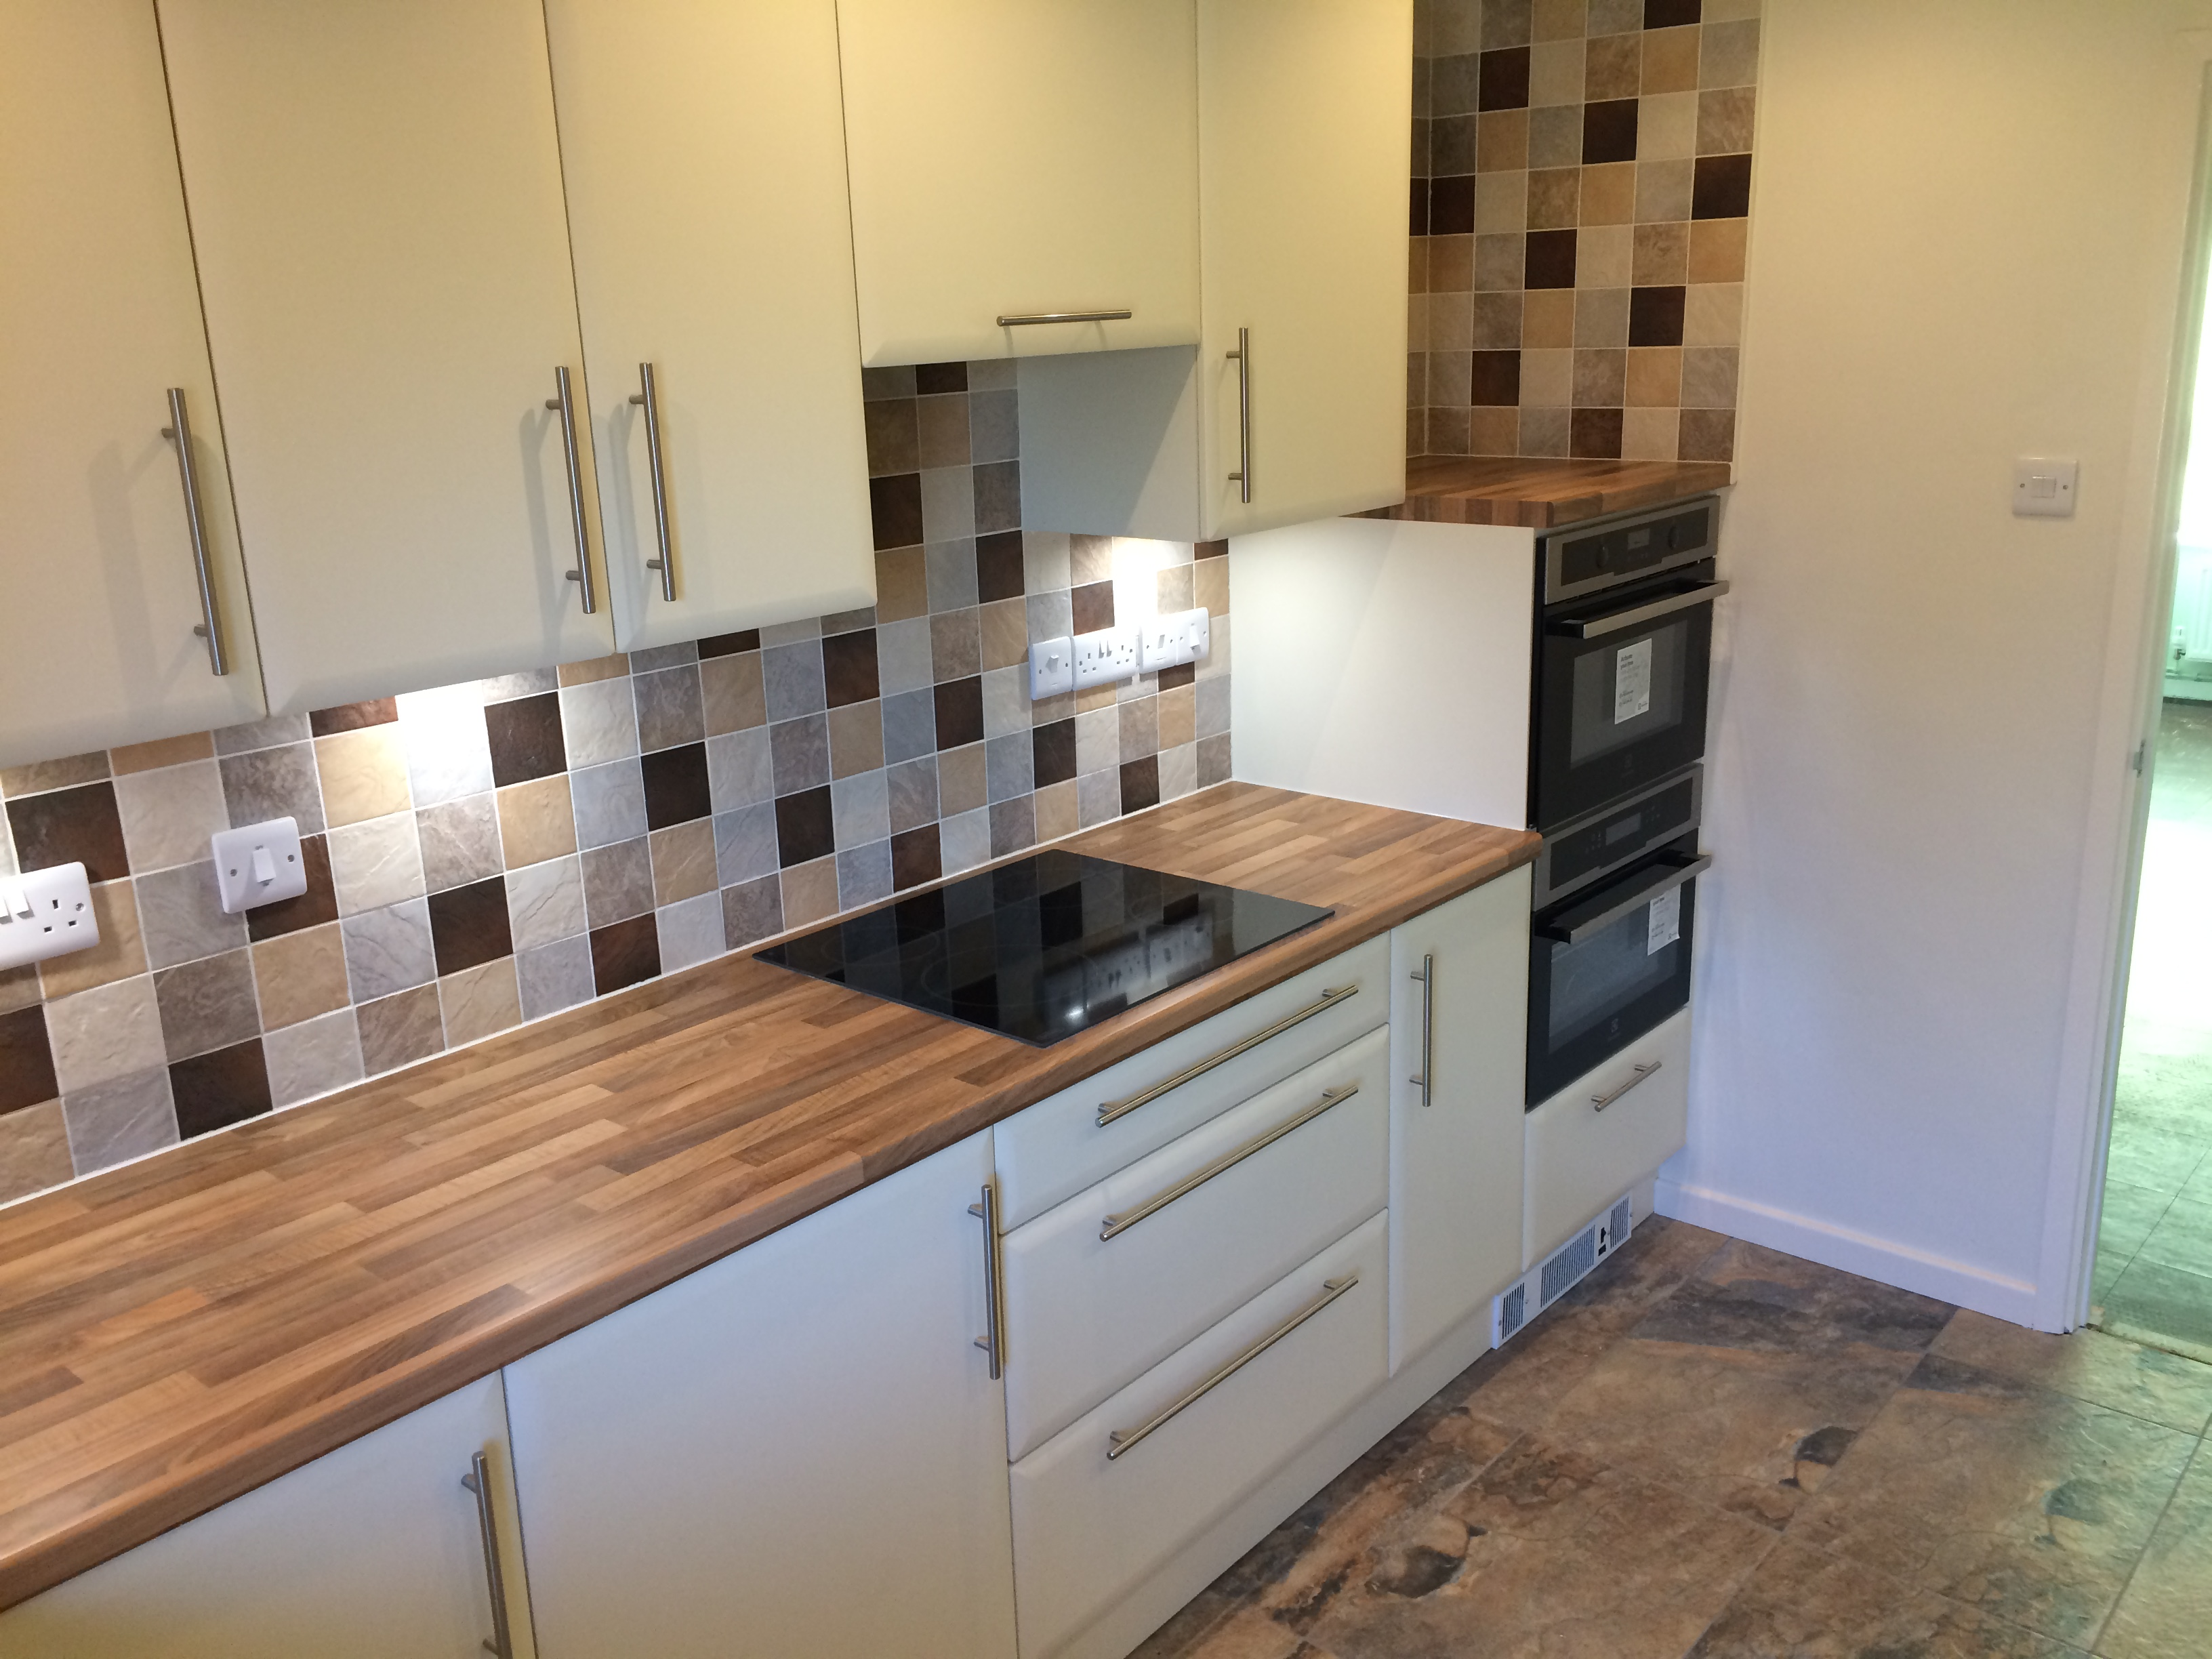 fitted kitchens shrewsbury. Black Bedroom Furniture Sets. Home Design Ideas